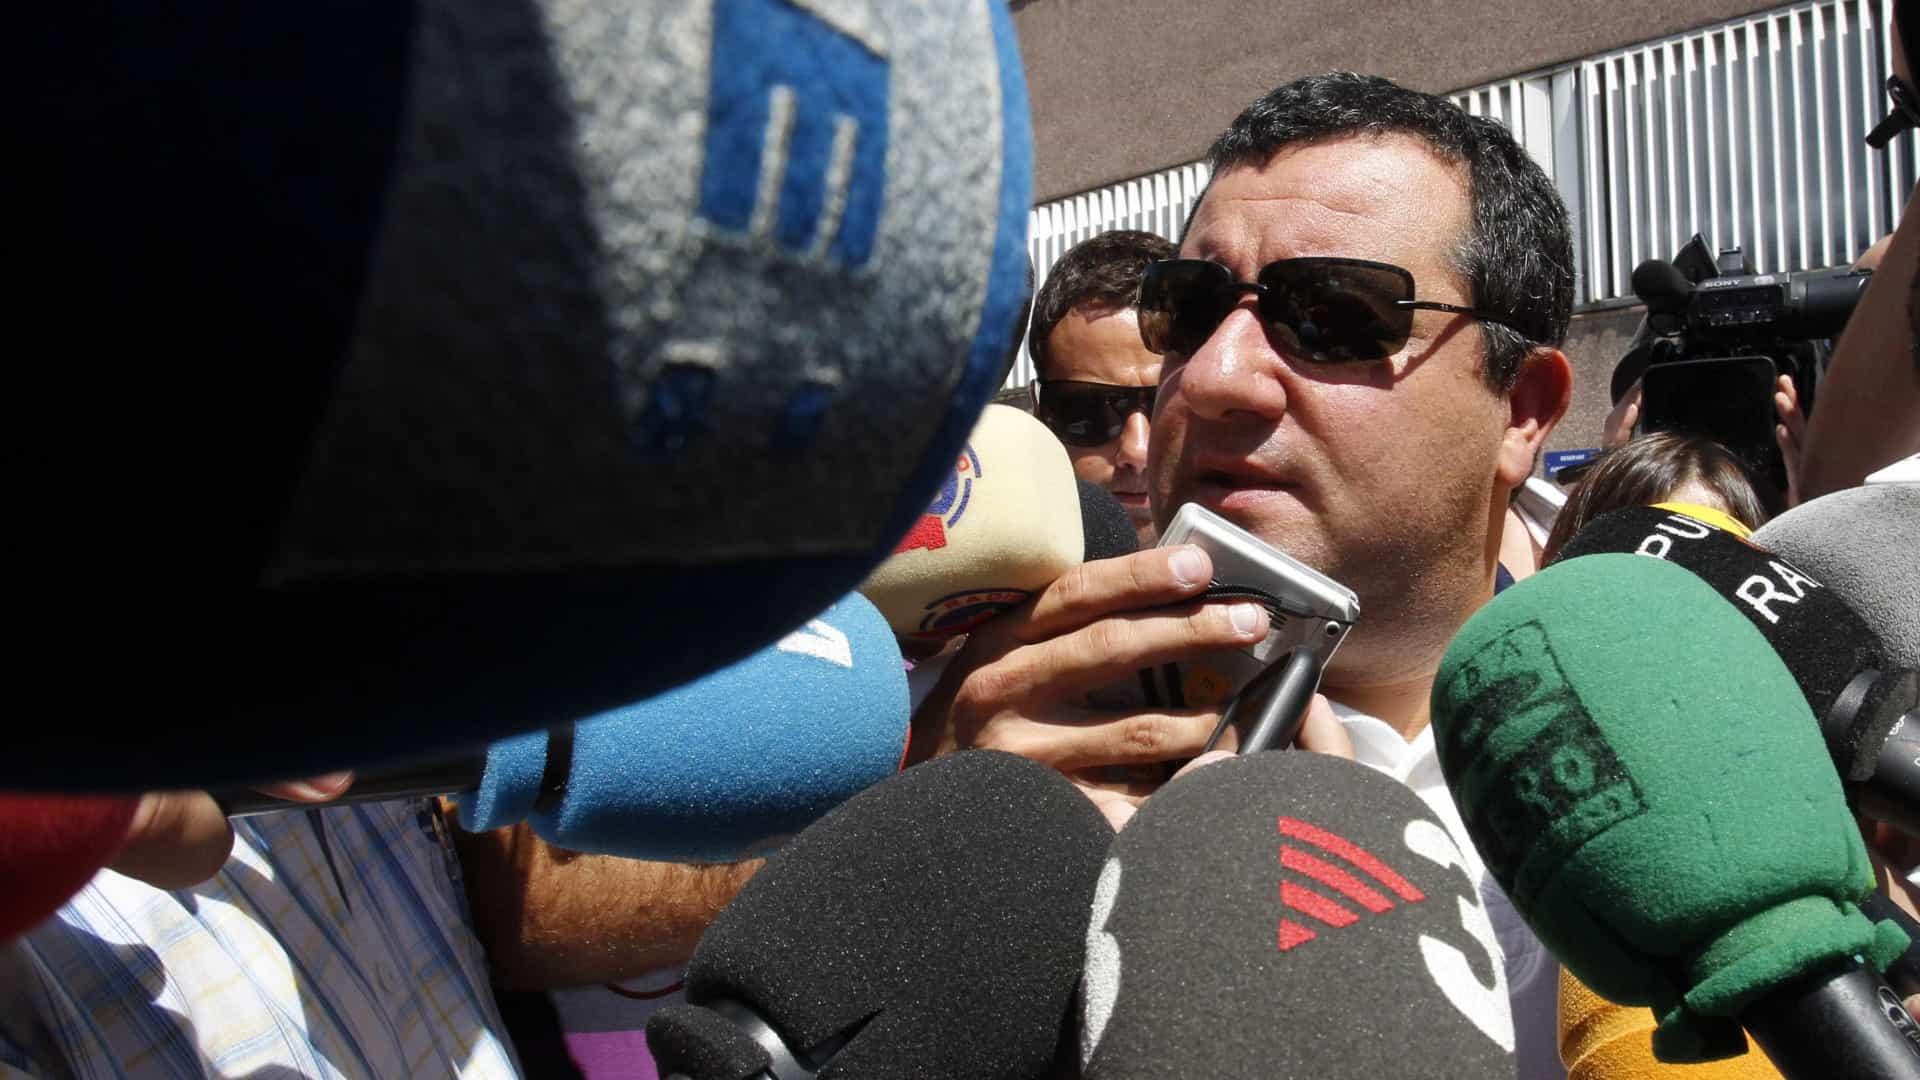 Italy- Football Agent-ایجنت-مدیر برنامه-ایتالیا